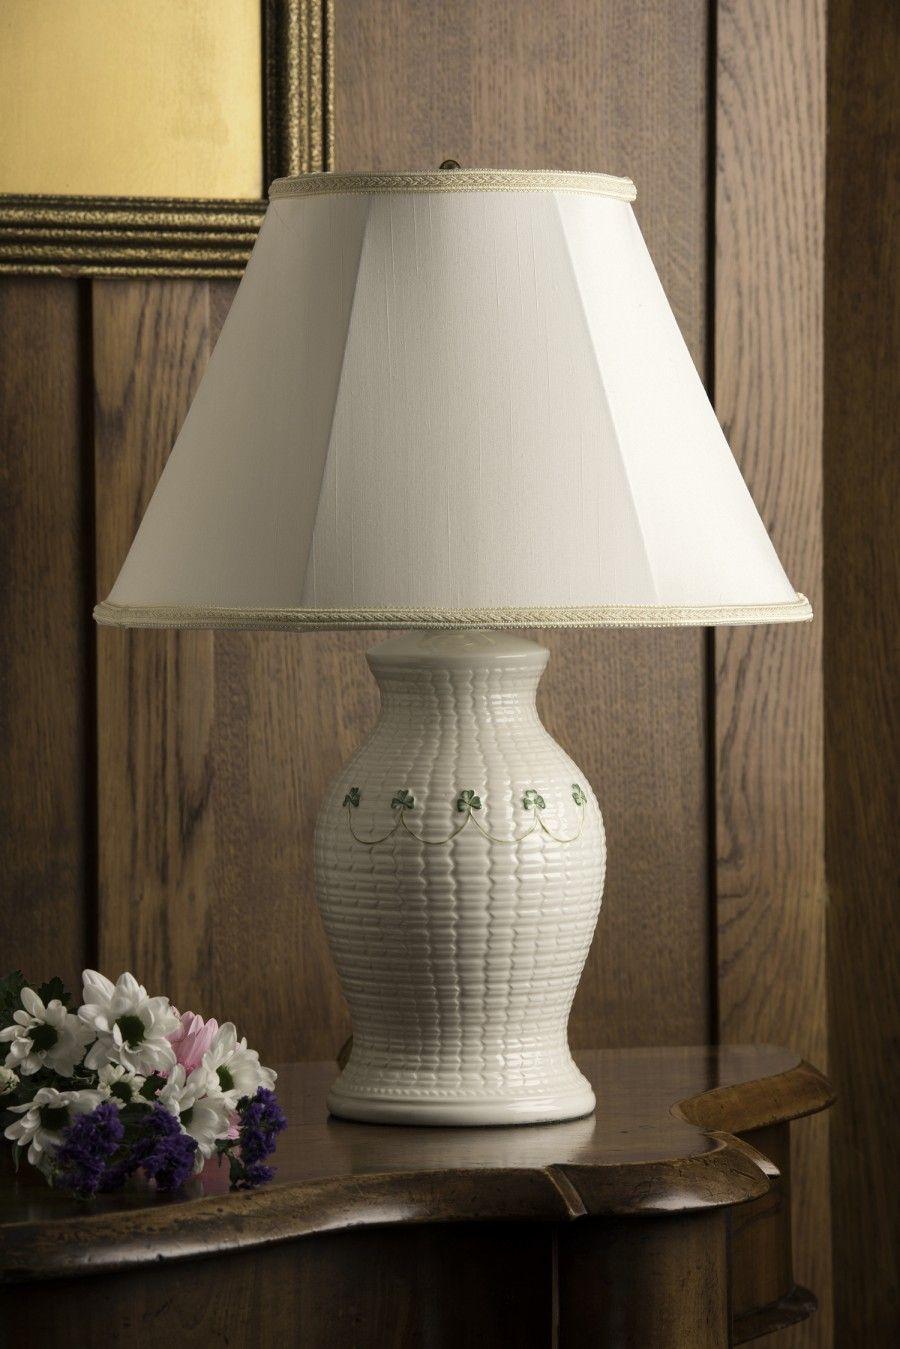 Braid Lamp (With images) Lamp, Lamp shade, Belleek